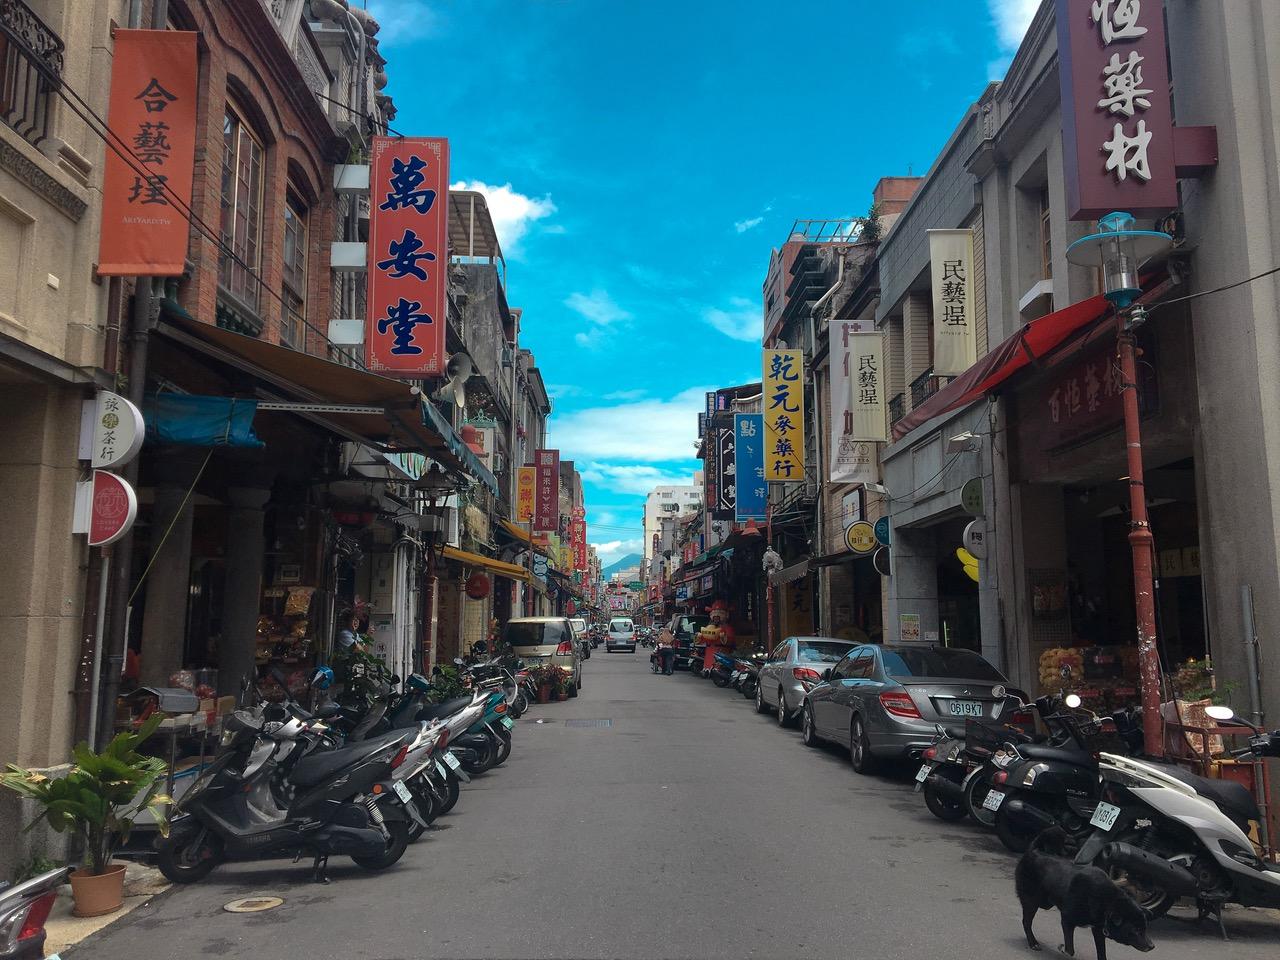 Visiter Taipei et se promener sur Dihua street